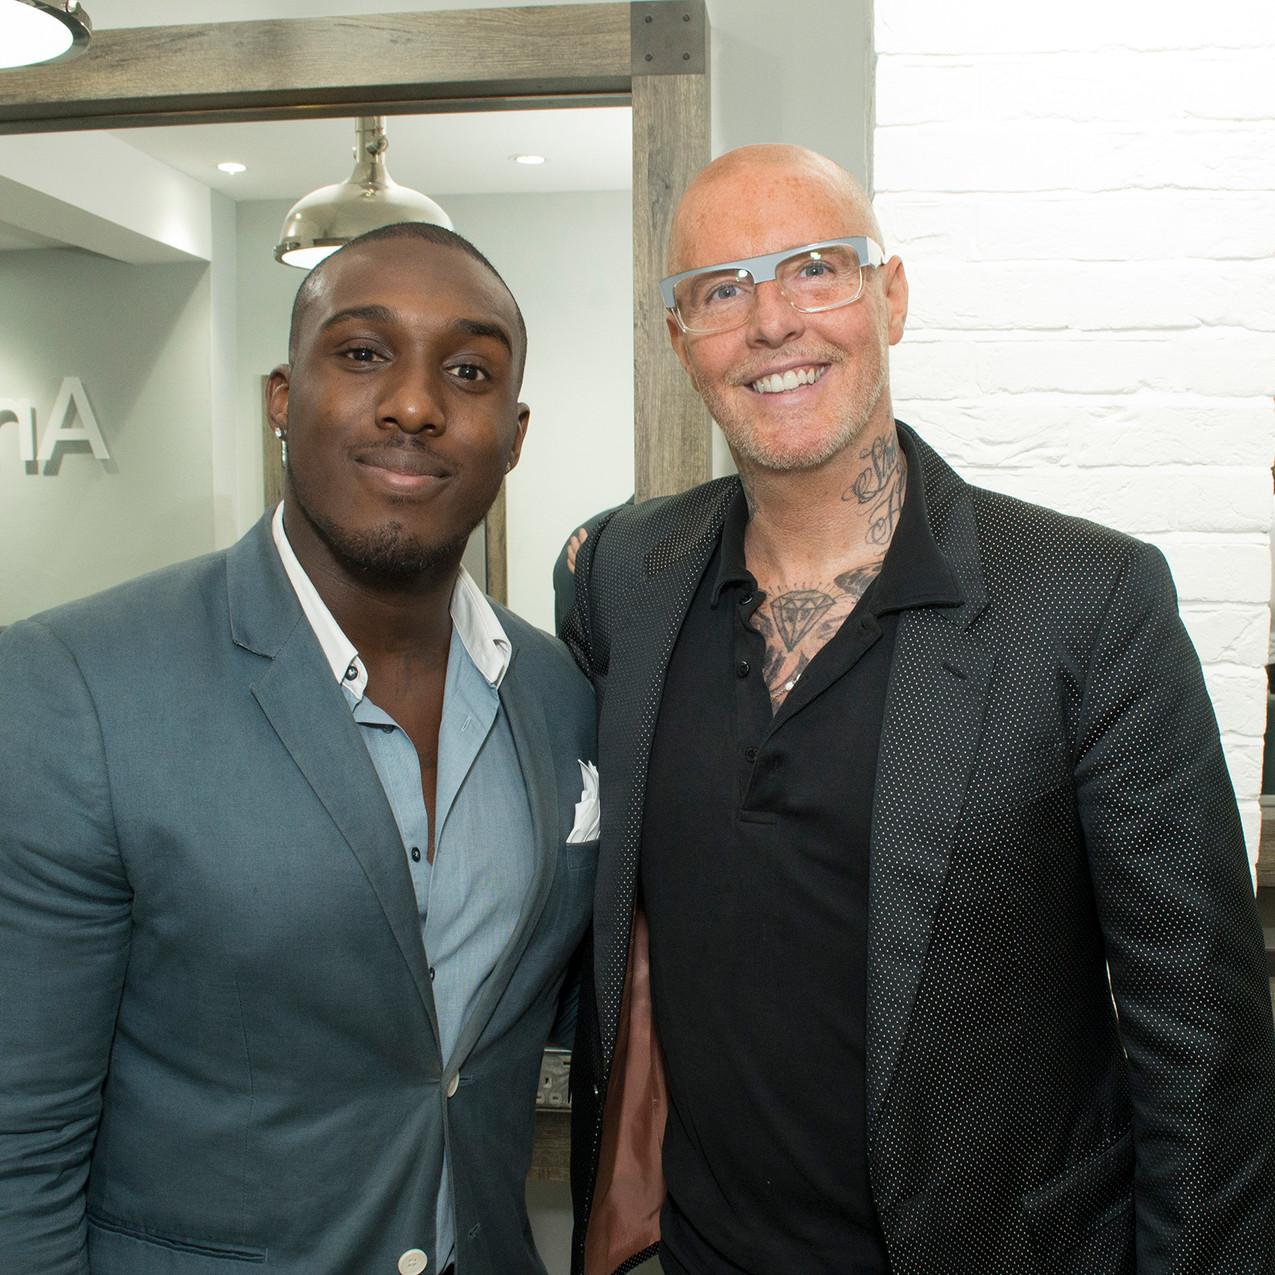 Aaron Archer Selfridges Personal Shopper and Celebrity Hairdresser Adee Phelan